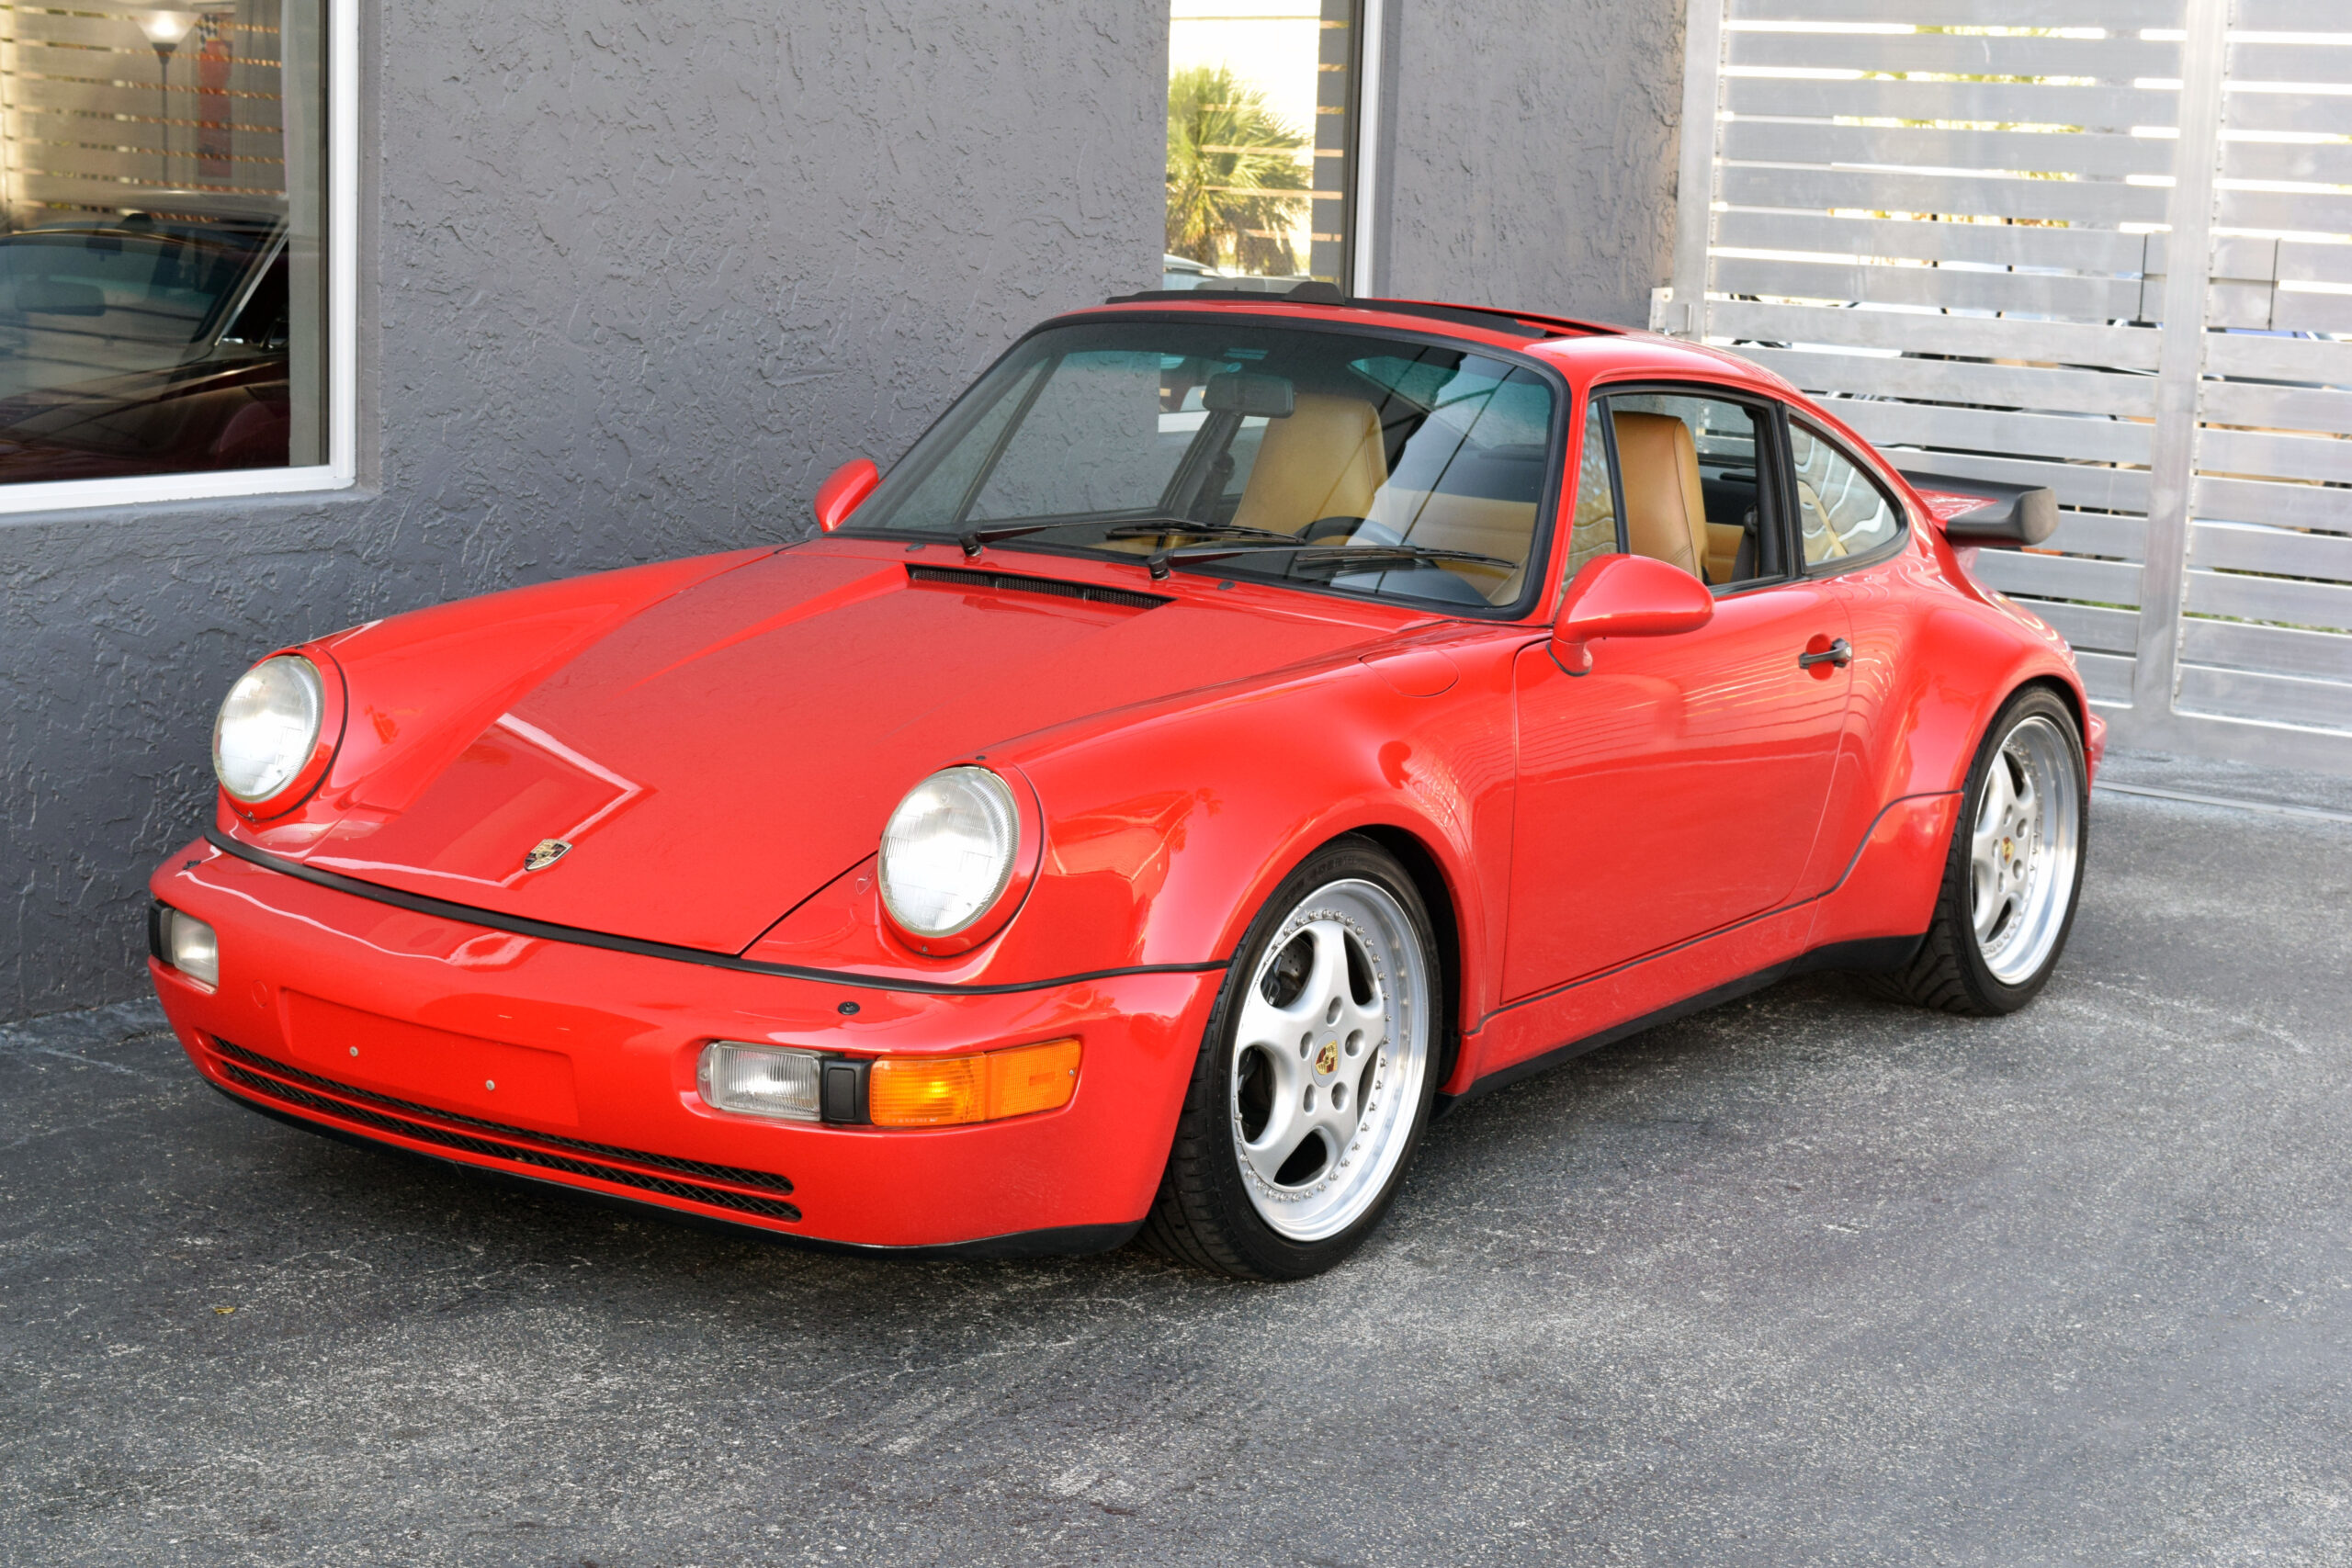 1991 964 965 TURBO, Speedlines, only 46k miles recently serviced, Arizona car